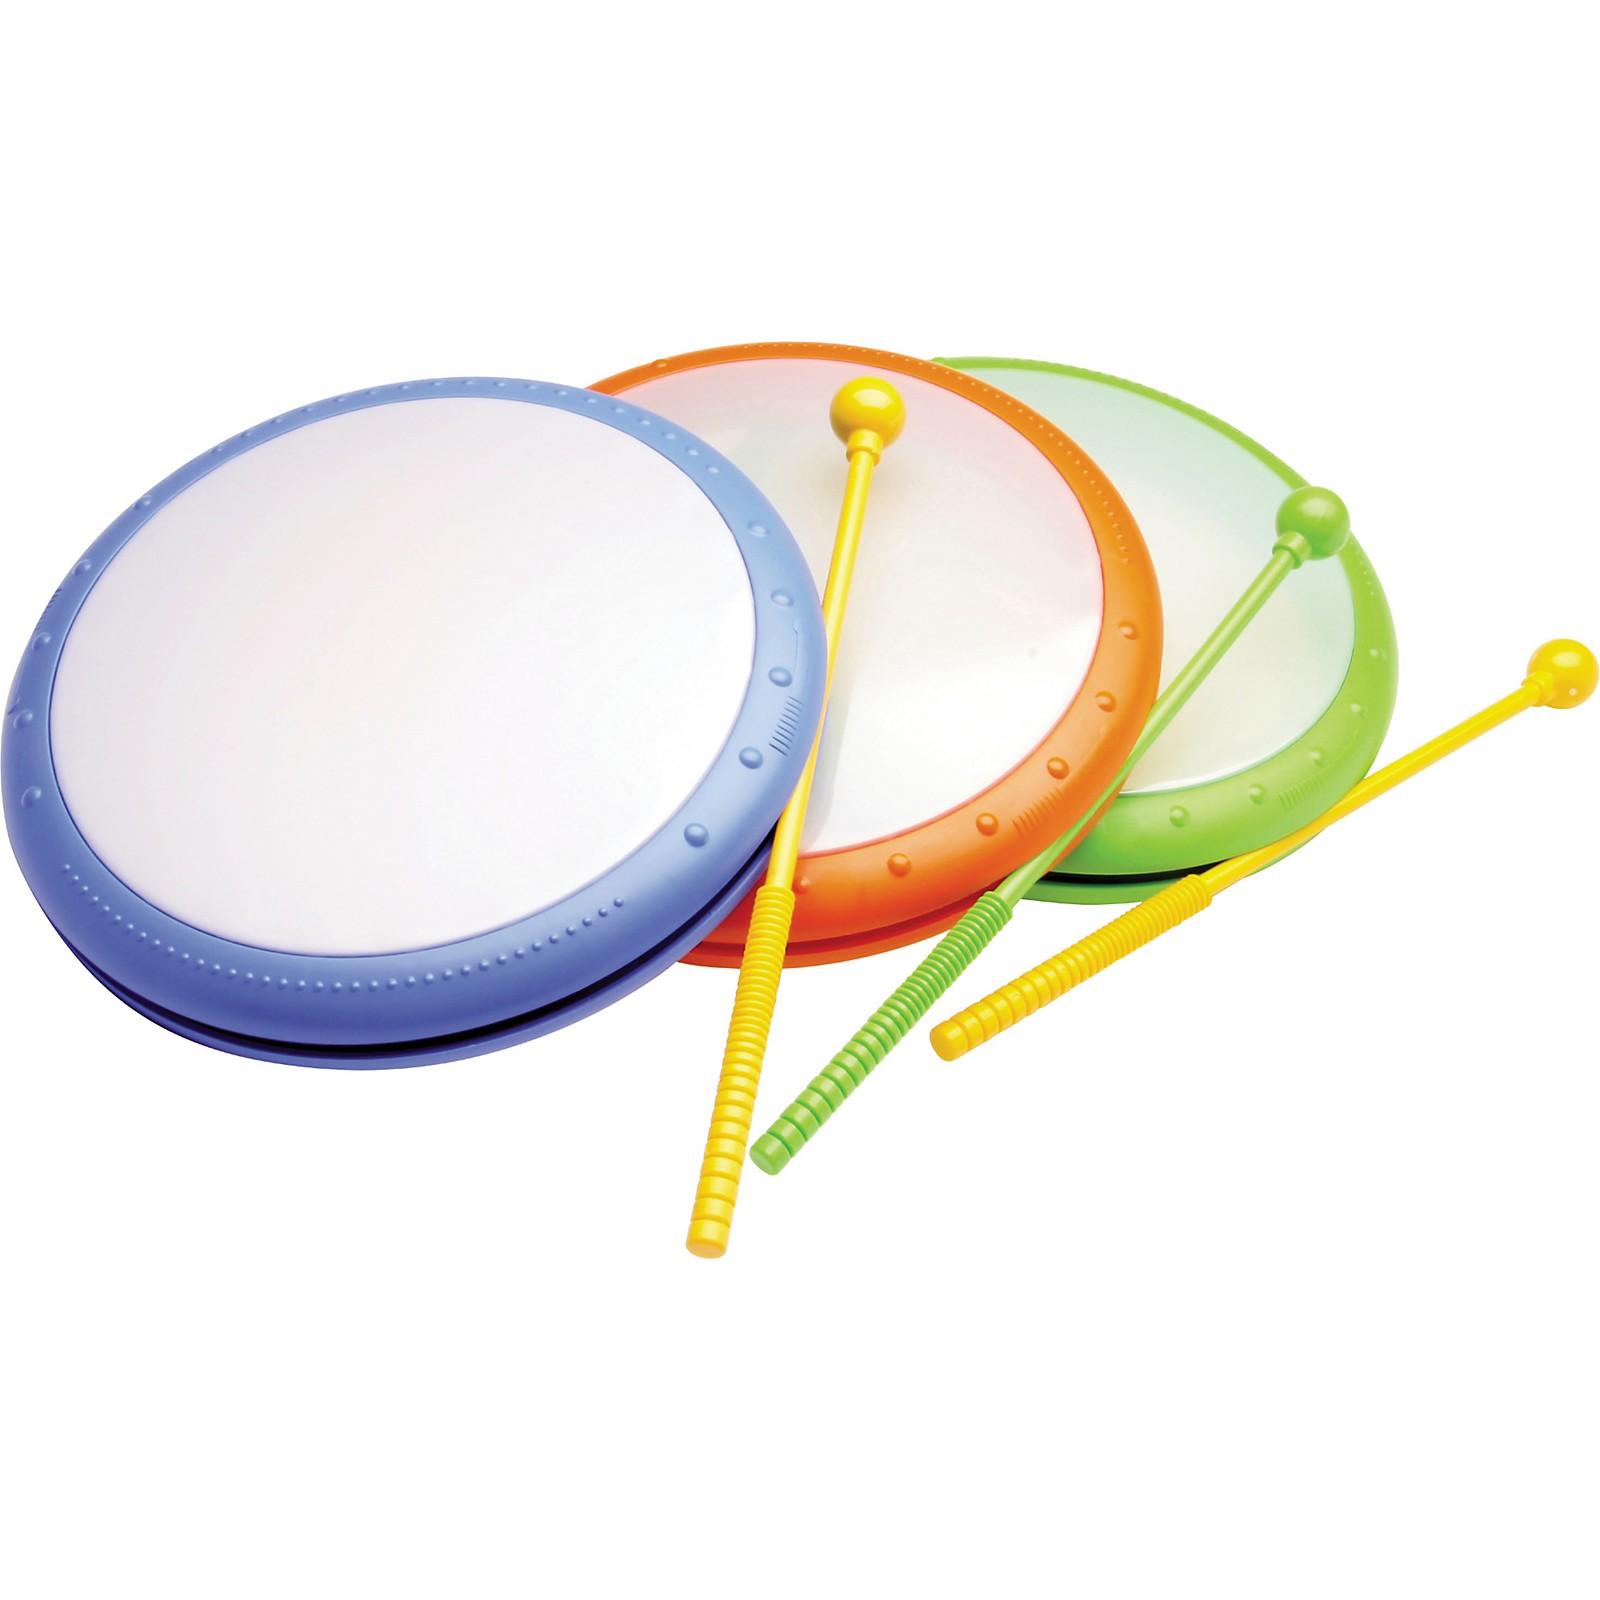 Hohner Kids Hand Drum with Mallet